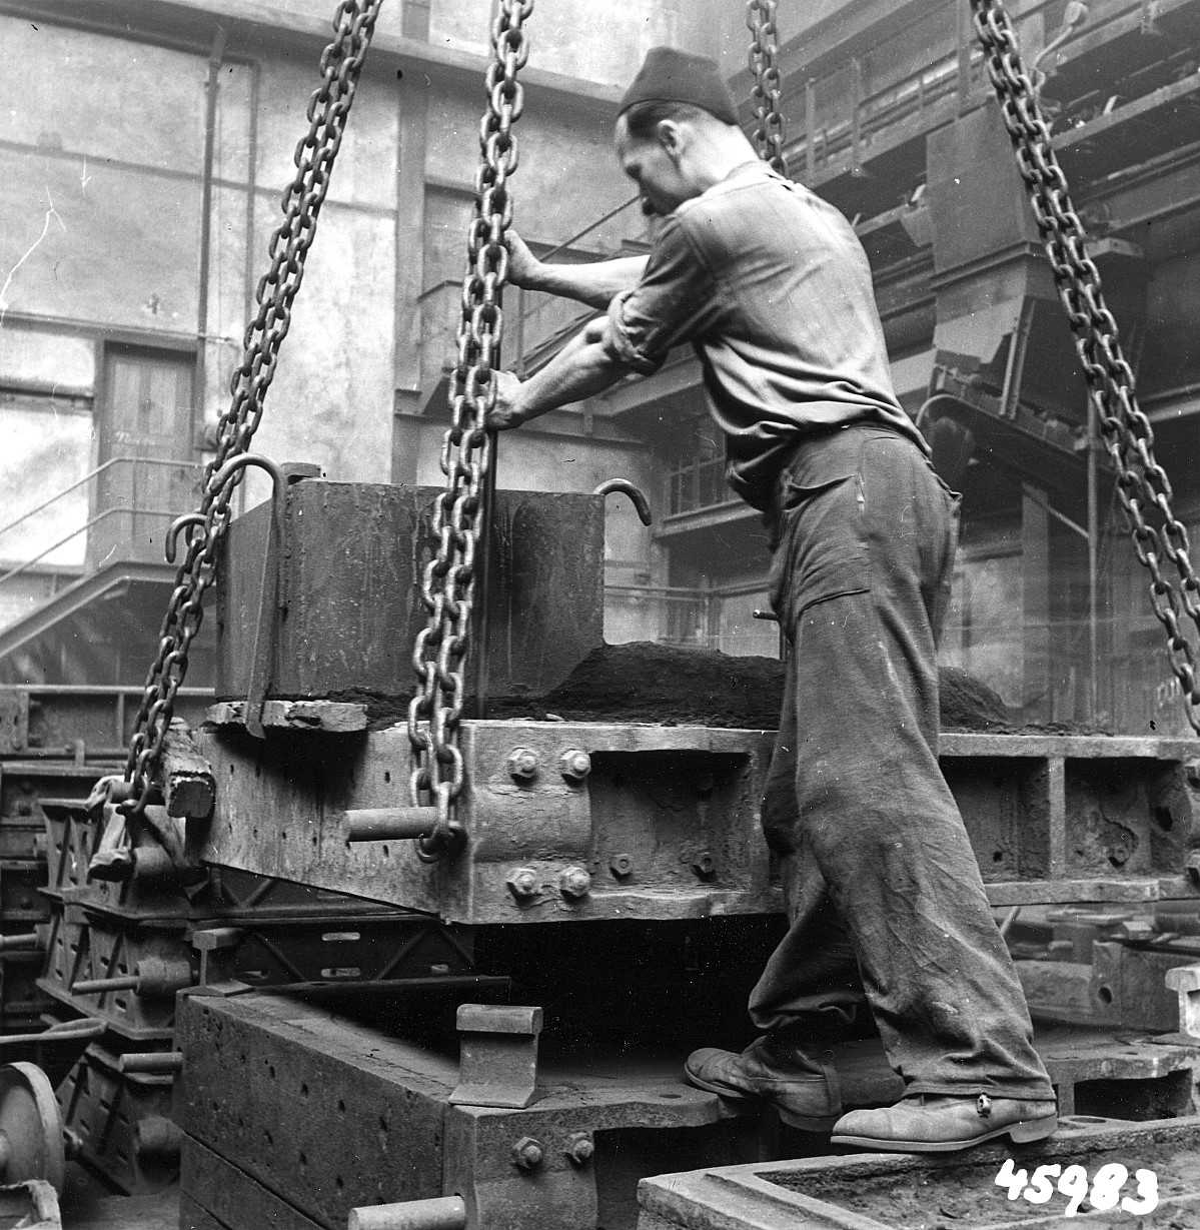 GFA 12/45983: Reportage casting process in malleable casting